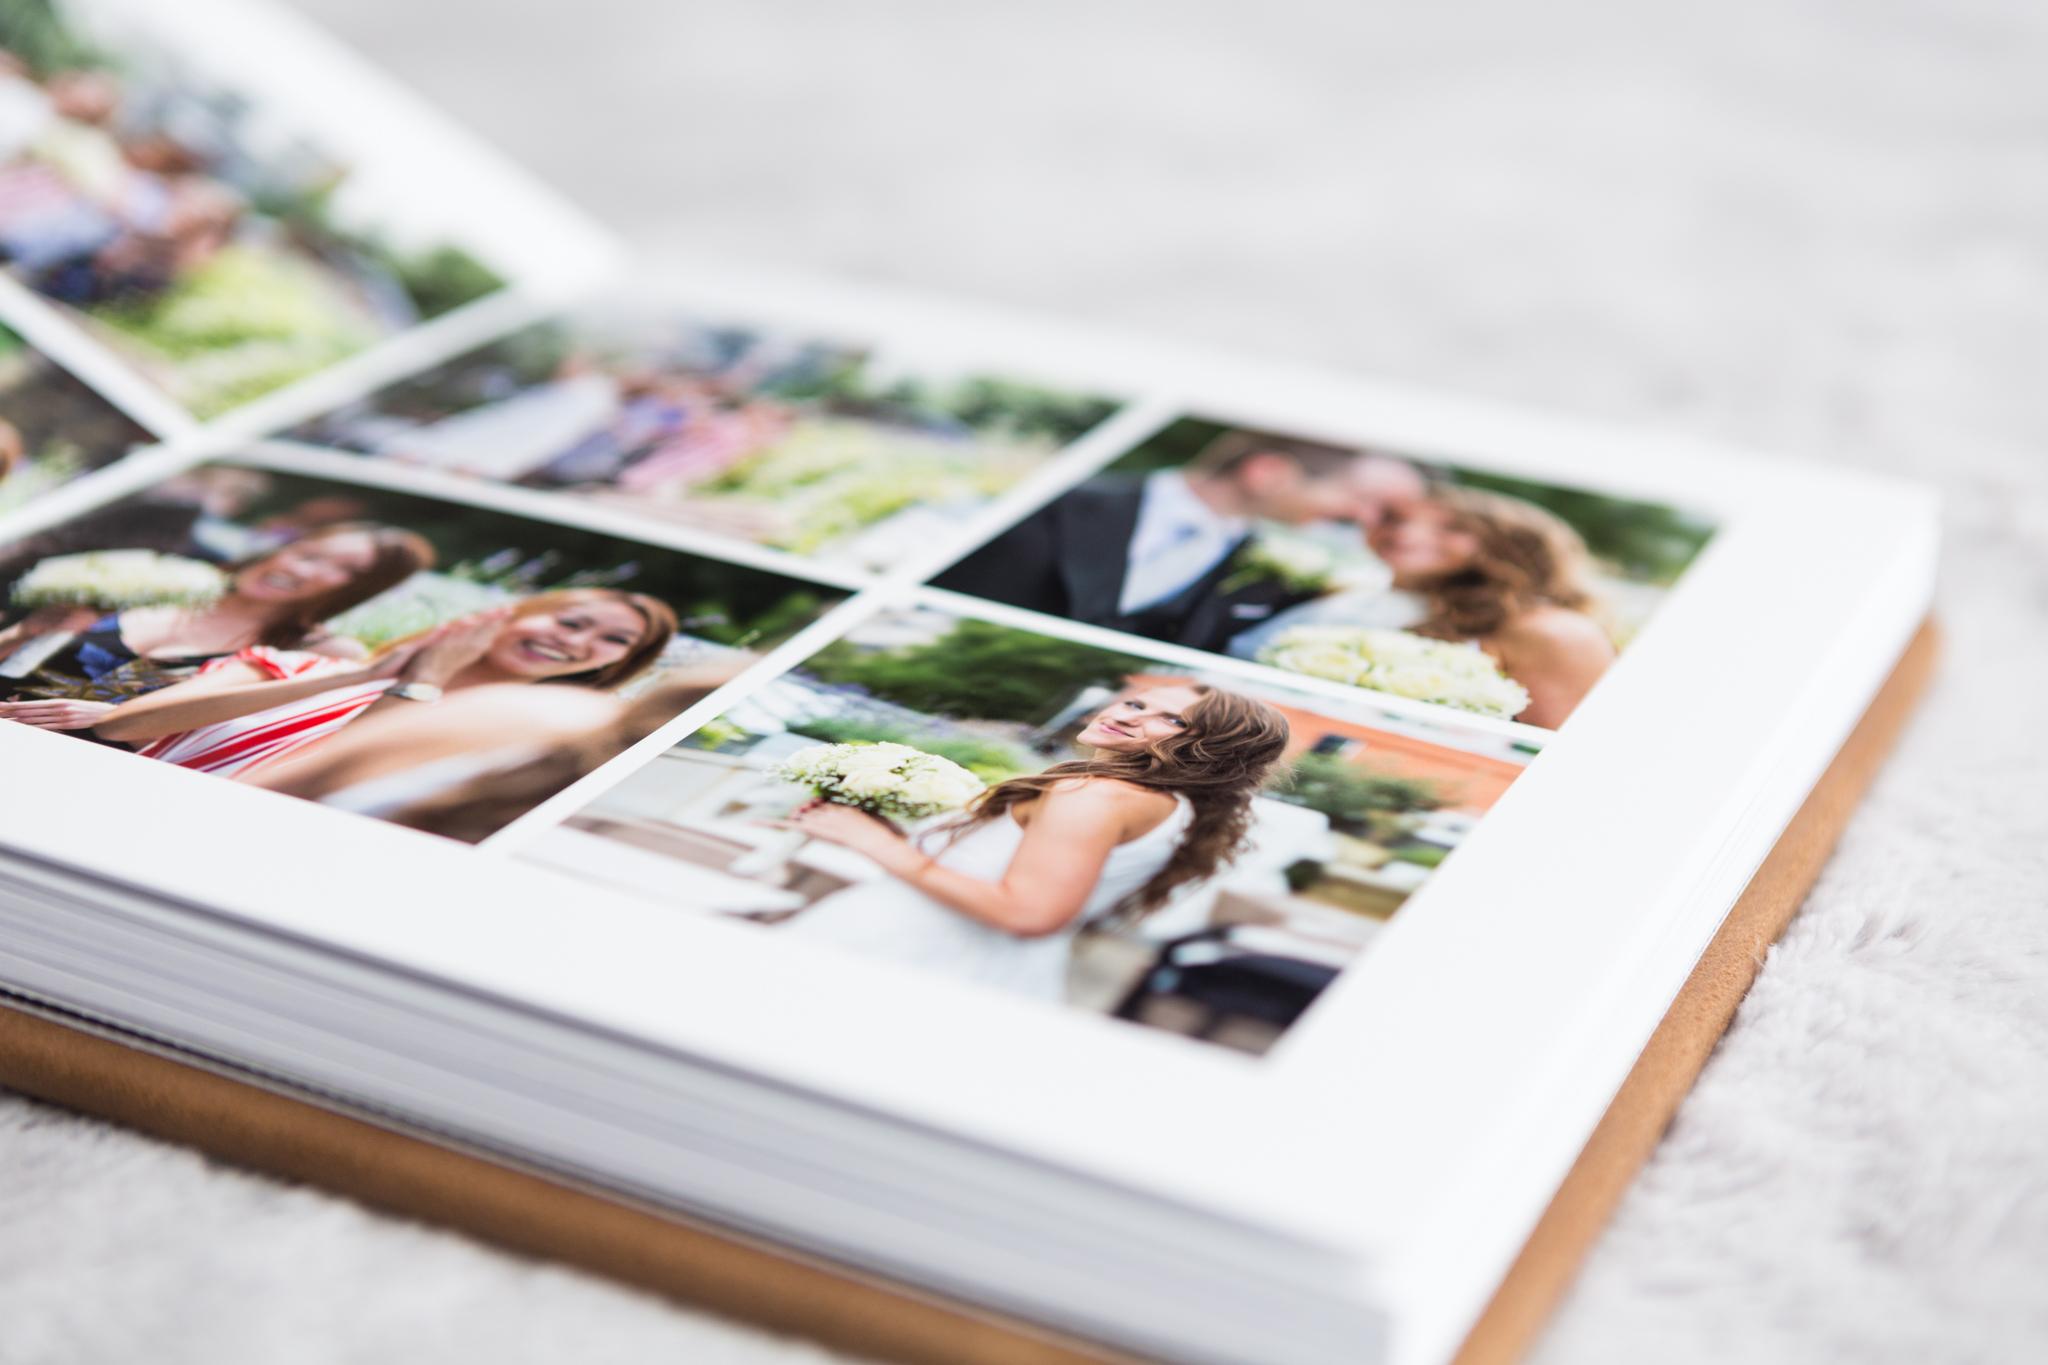 Deluxe_Storybook_Wedding_Album_Photographer_Rachel_Thornhill_Photography